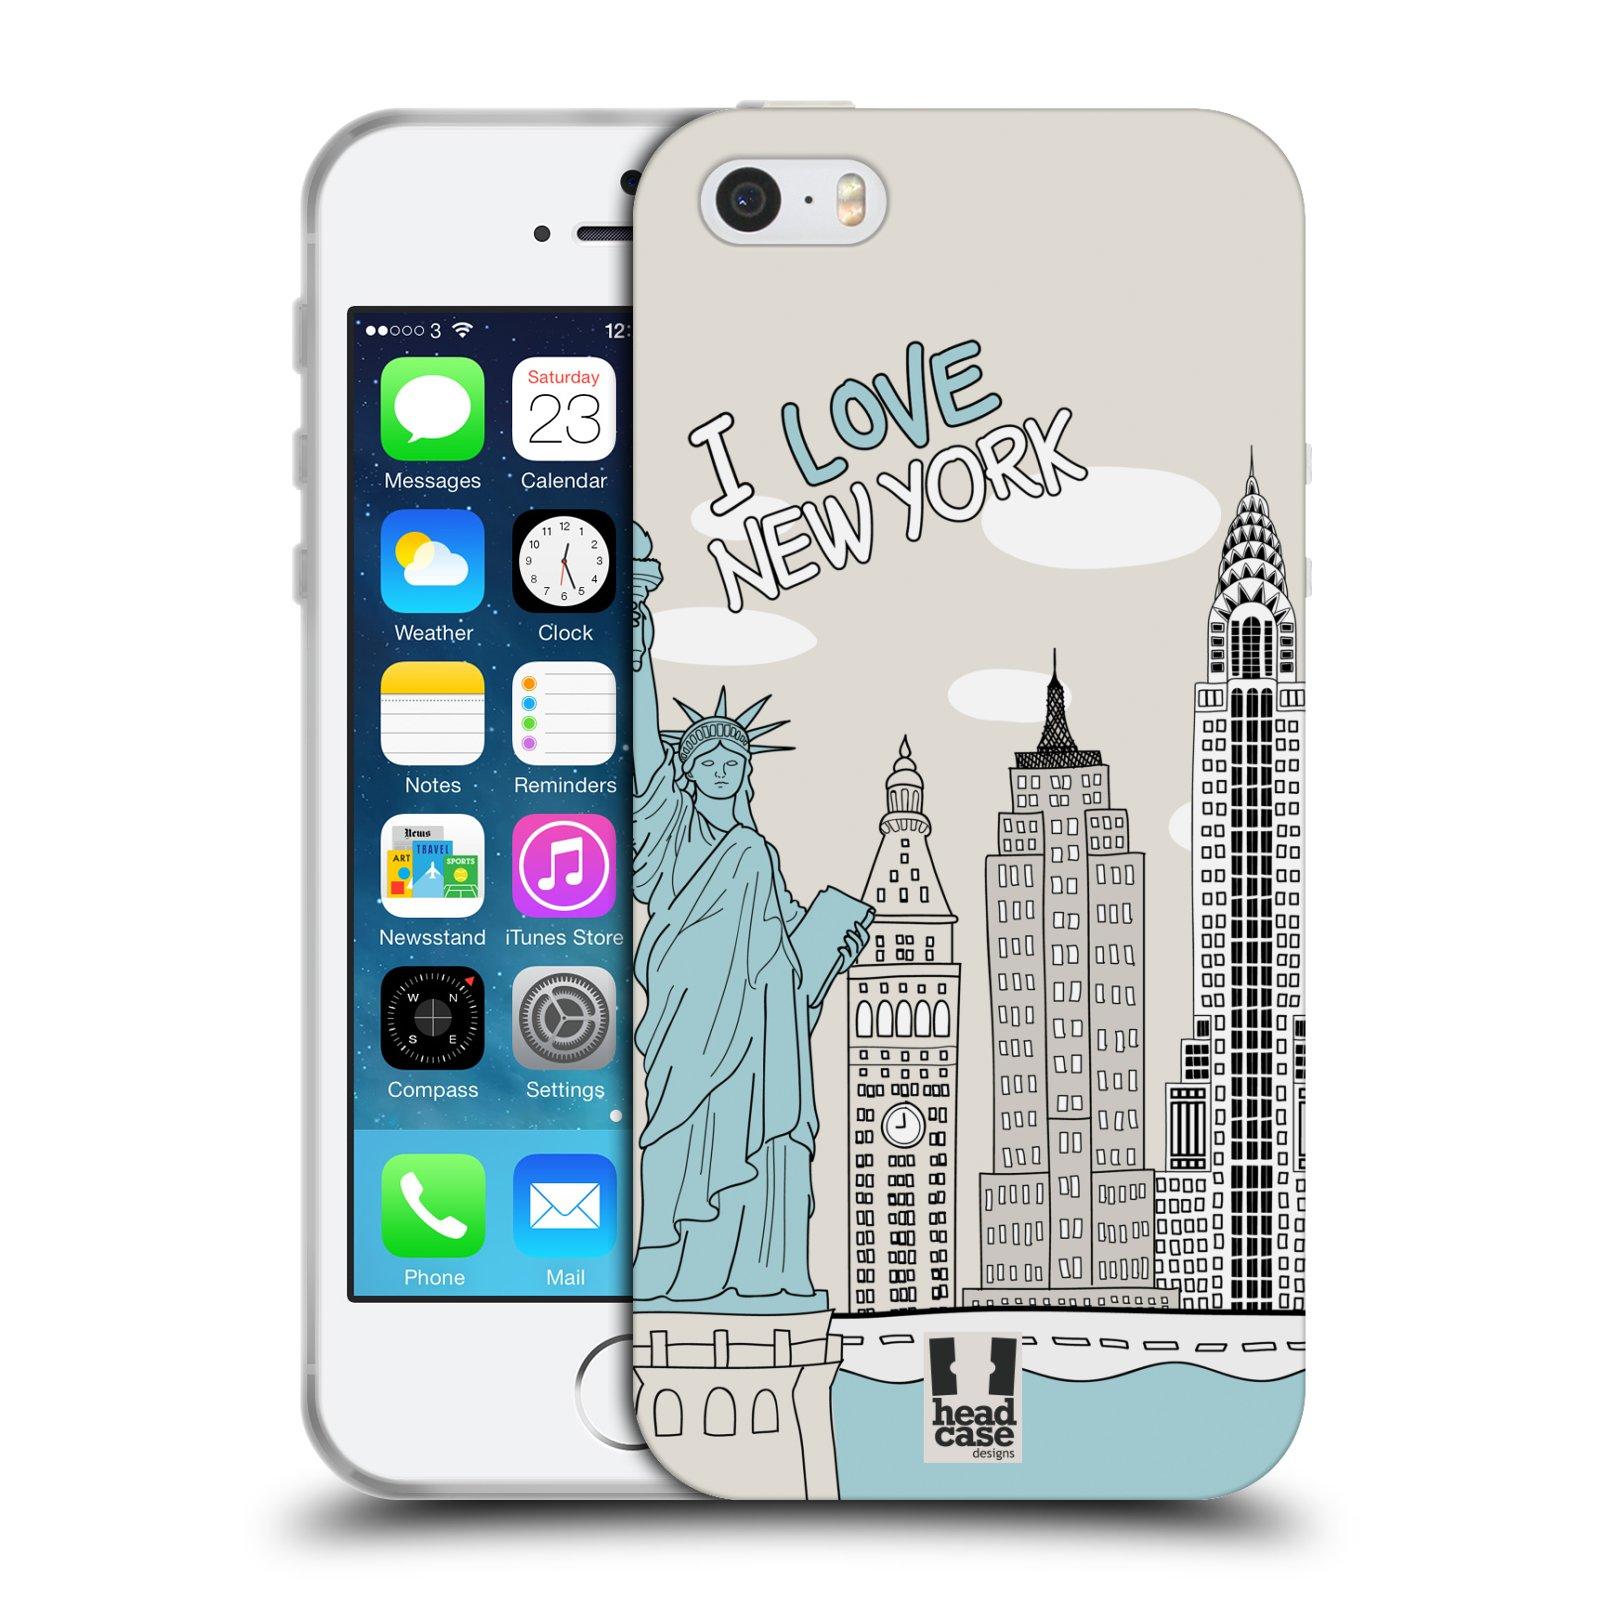 HEAD CASE silikonový obal na mobil Apple Iphone 5/5S vzor Kreslená městečka MODRÁ, USA, New York, I LOVE NEW YORK